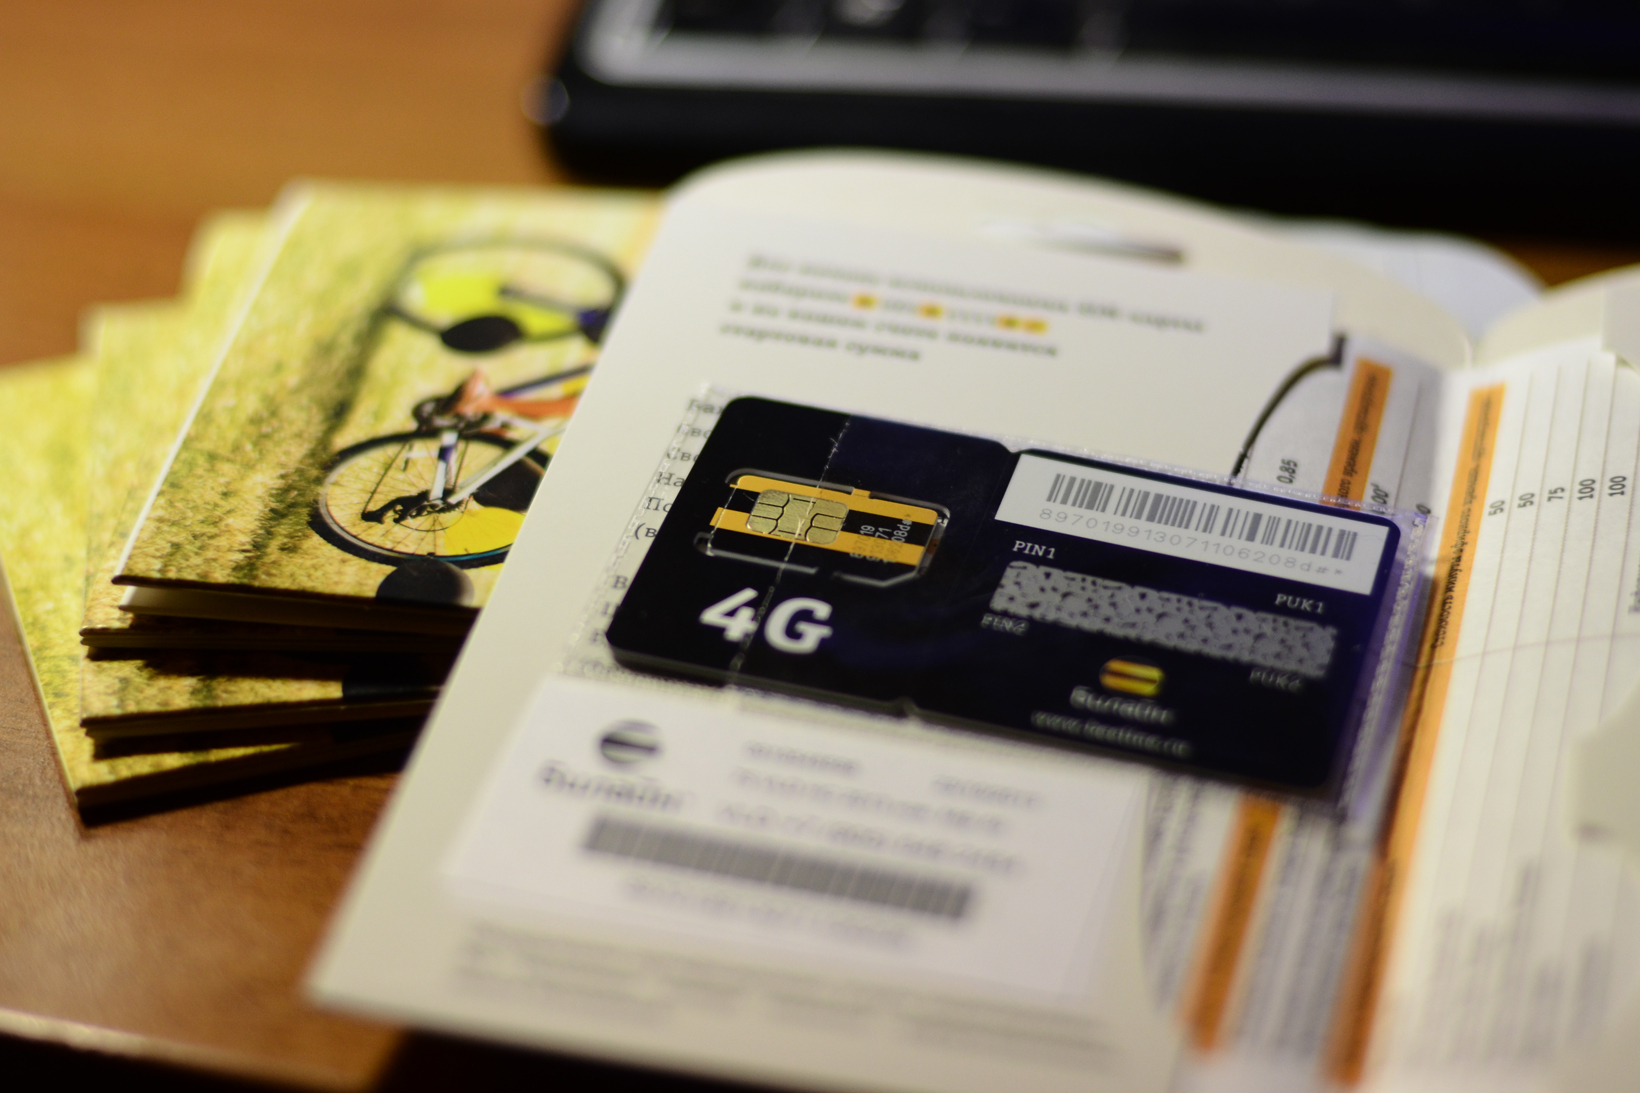 «Билайн» увеличивает пакет интернета предоставляет безлимит в сетях 4G